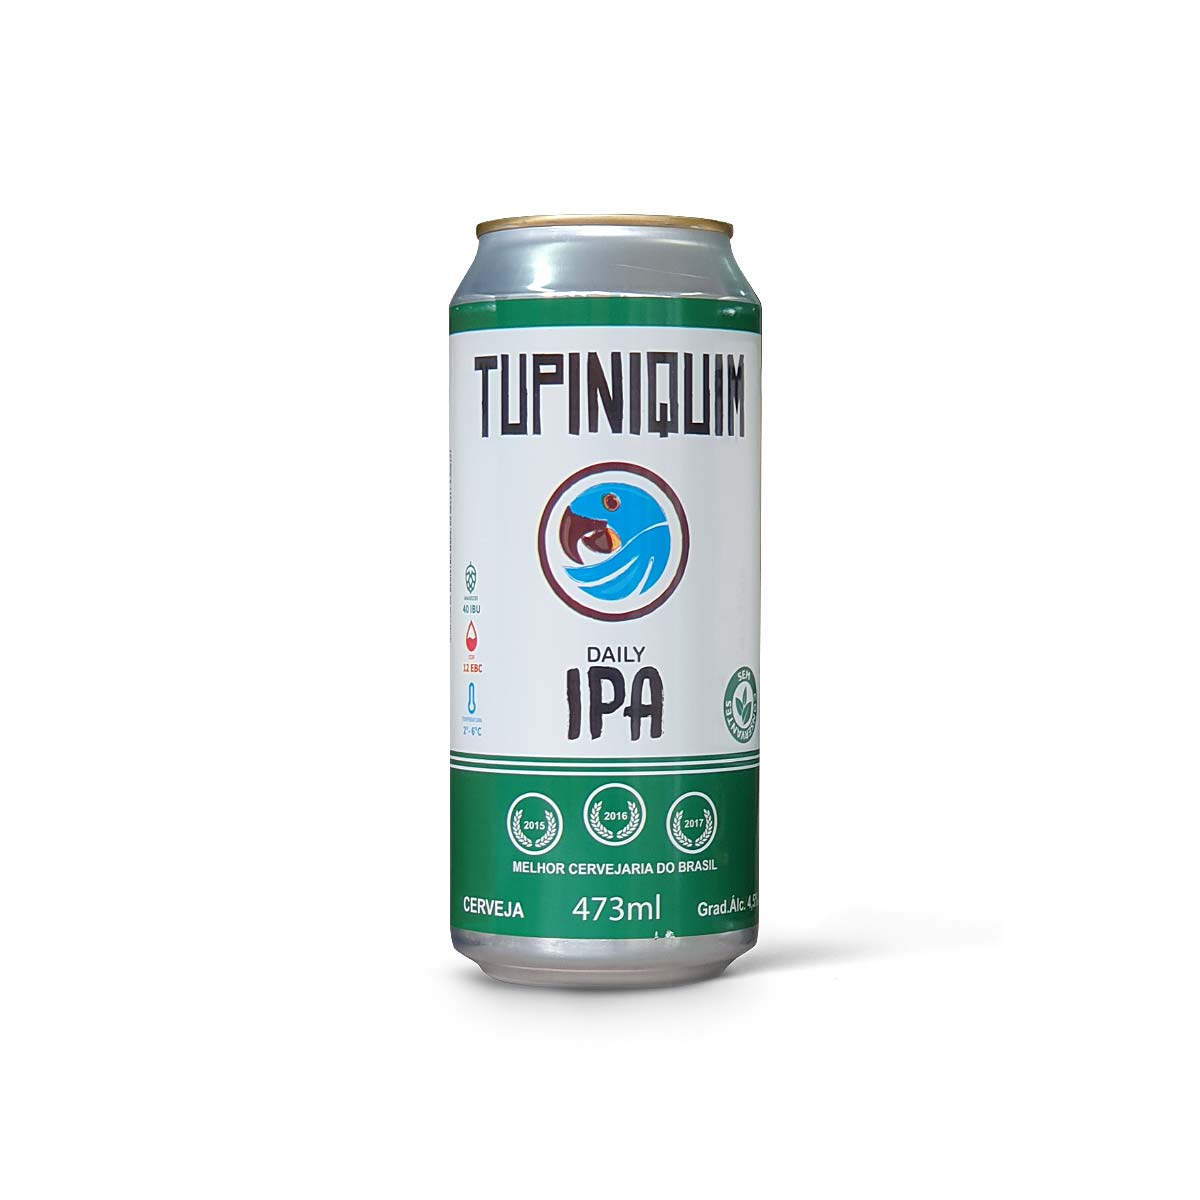 Tupiniquim Daily IPA 473ml lata